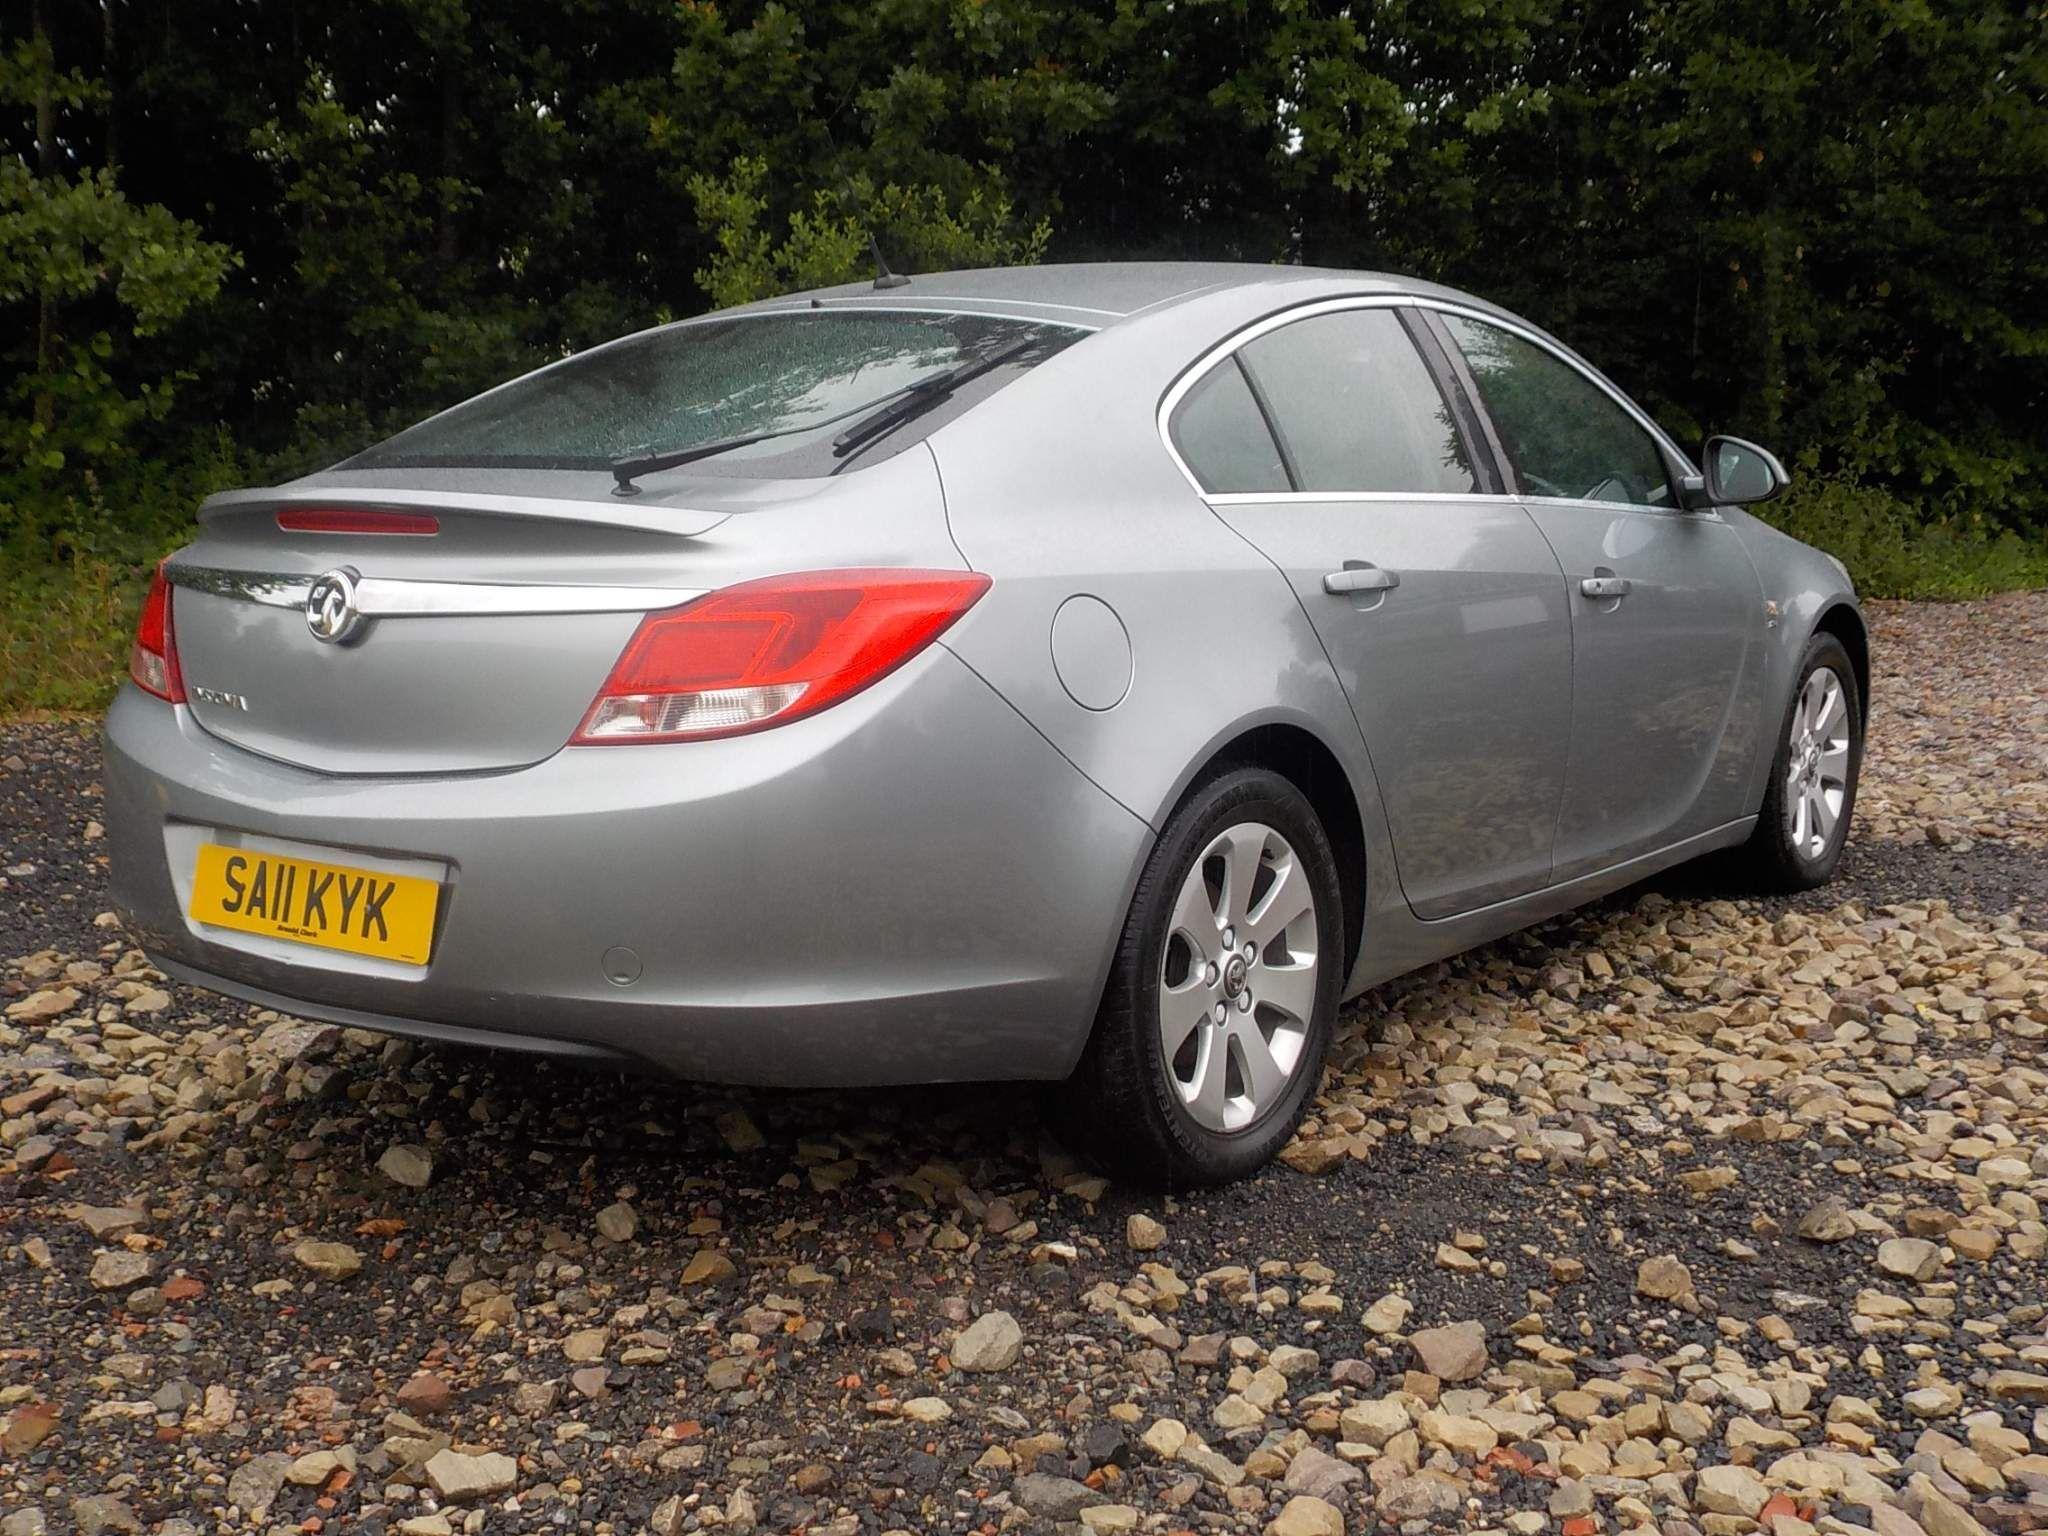 Vauxhall Insignia 1.8 i VVT 16v SRi 5dr